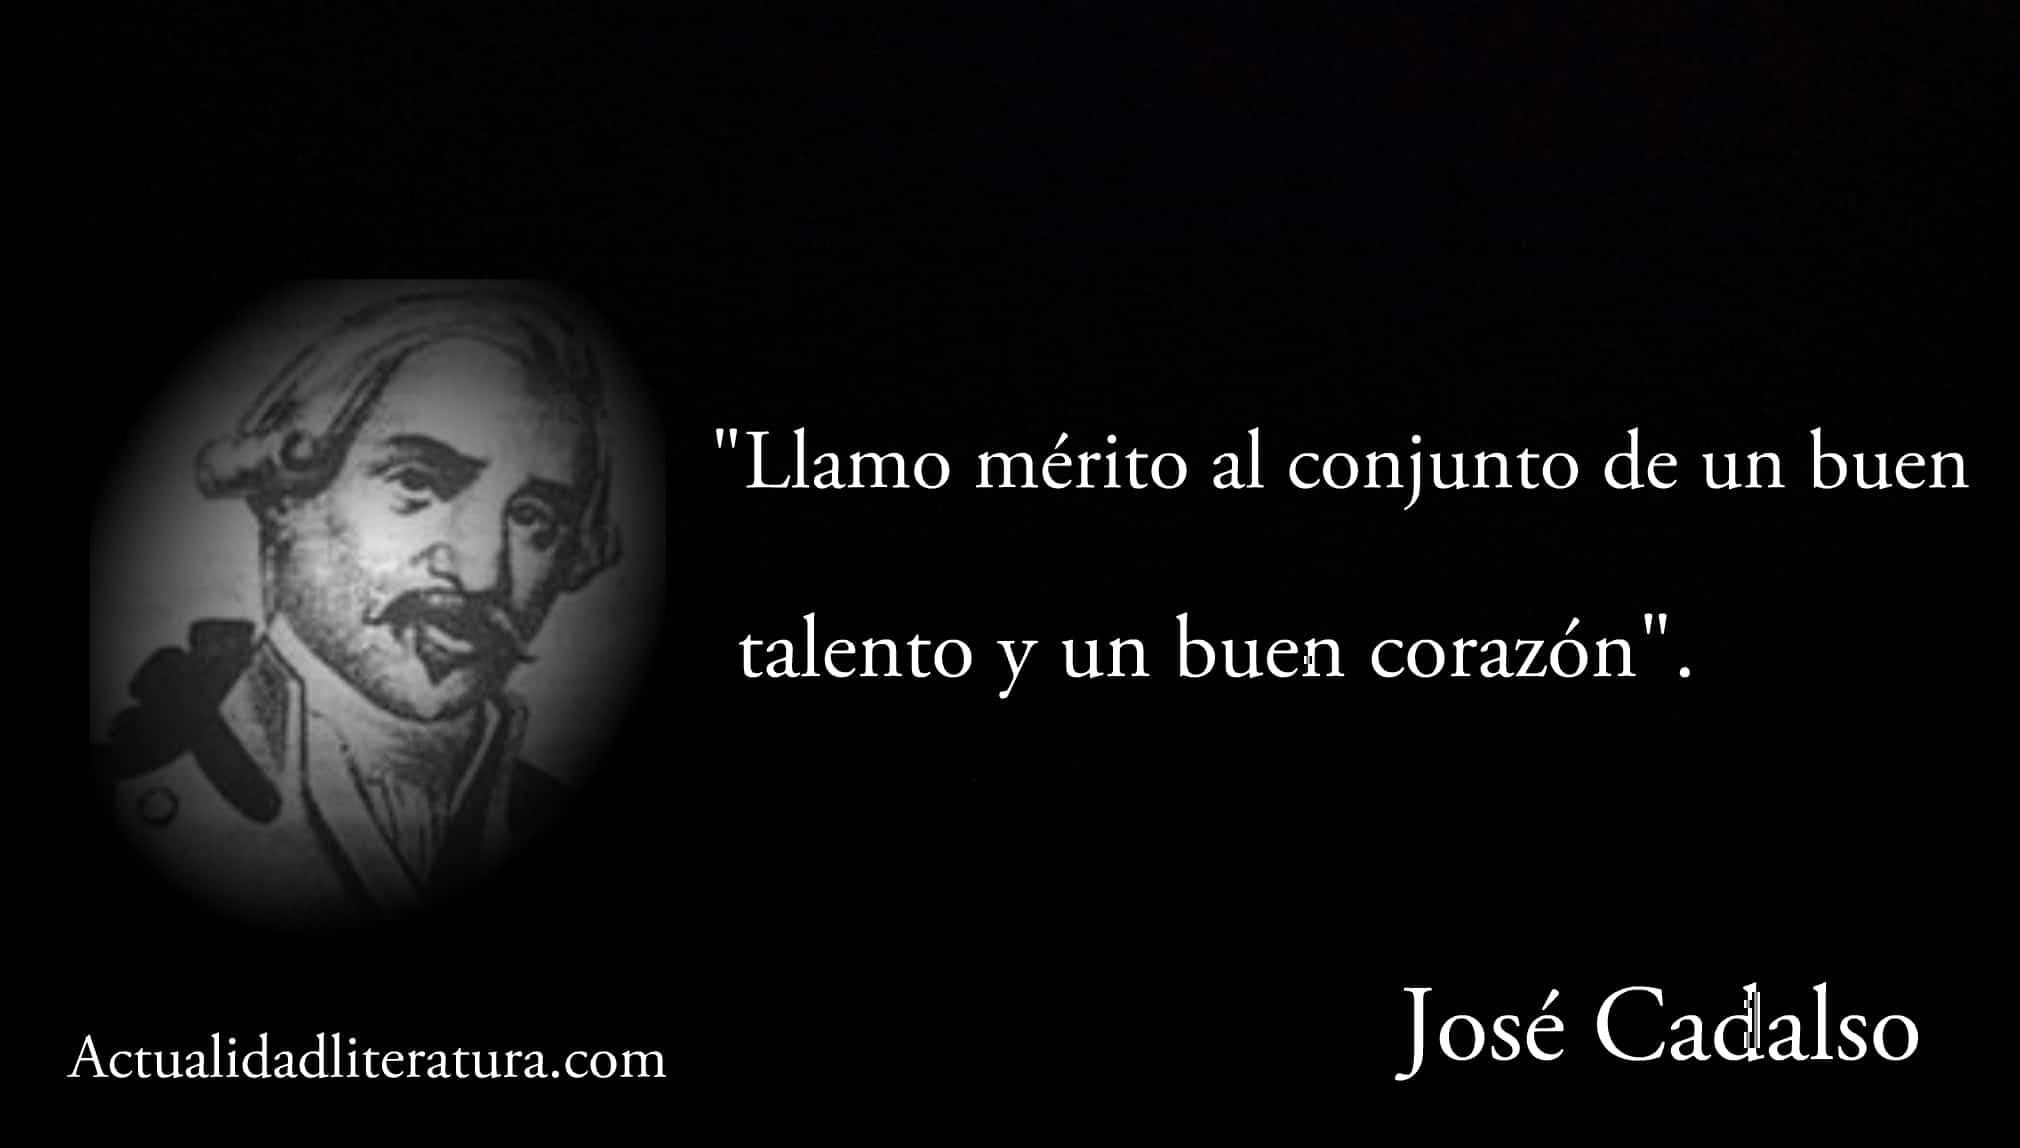 Frase de José Cadalso.